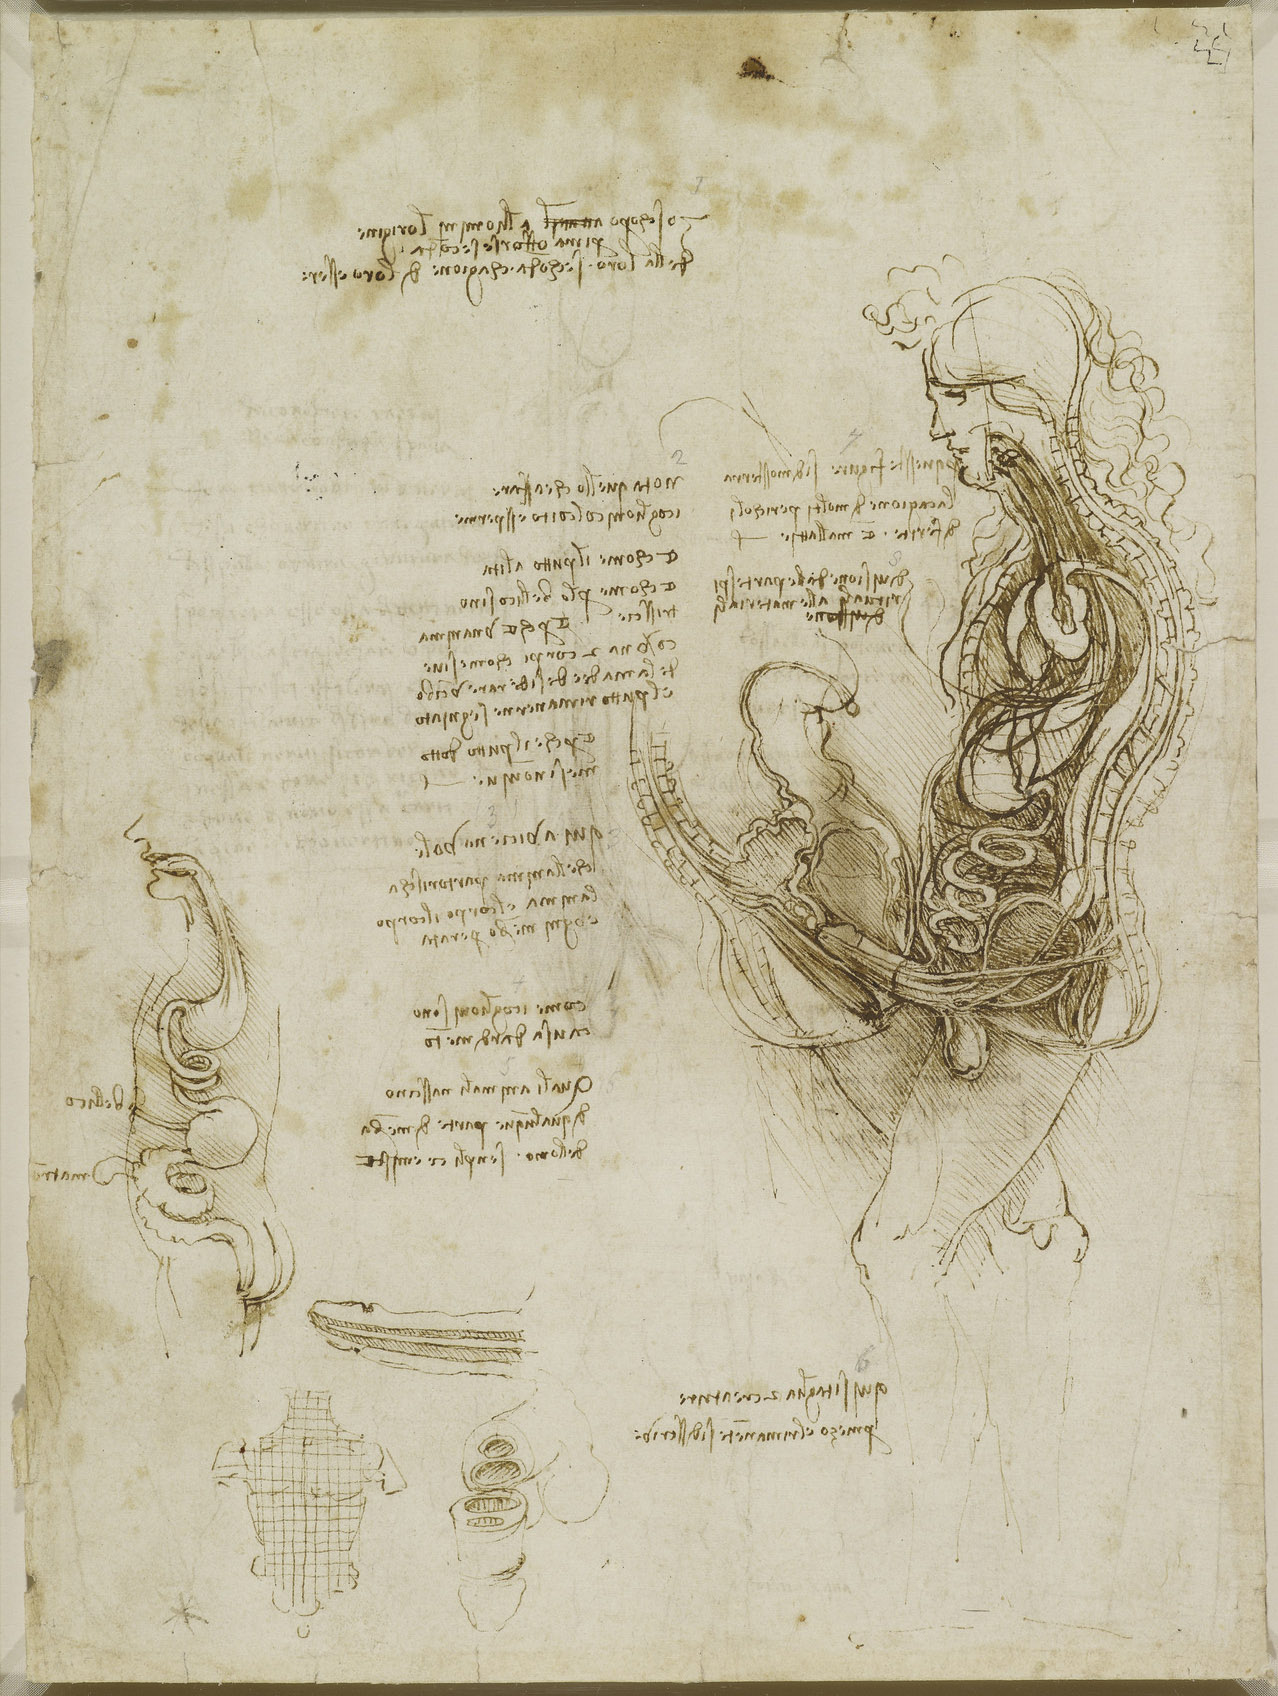 Leonardo da Vinci és a pénisz szabad akarata